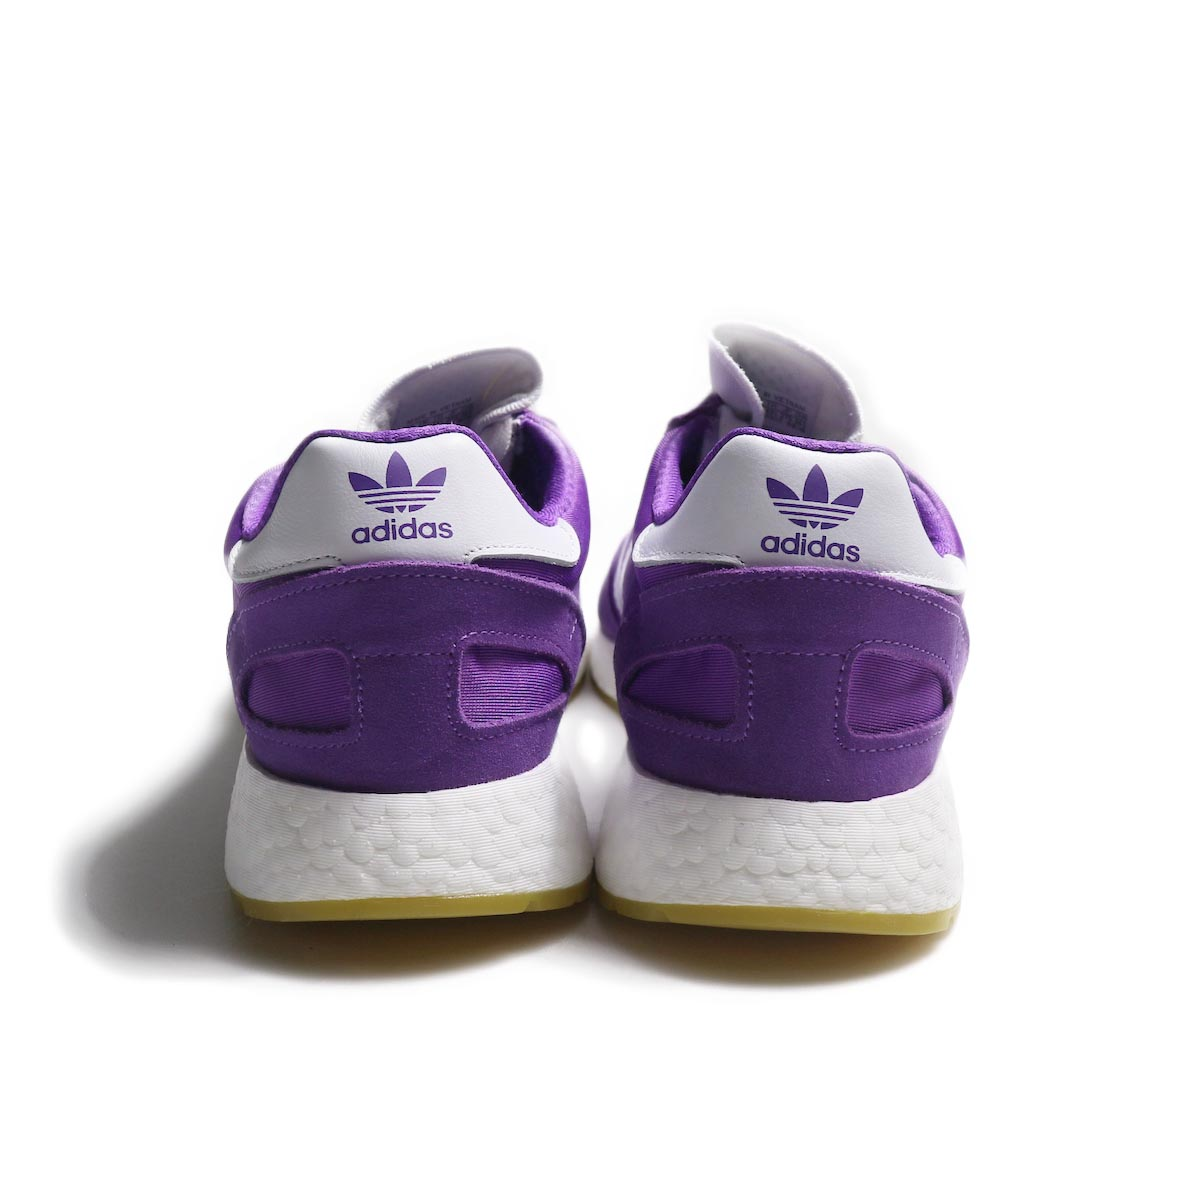 adidas originals / CONTINENTAL80 (G27706) -White 後サイド